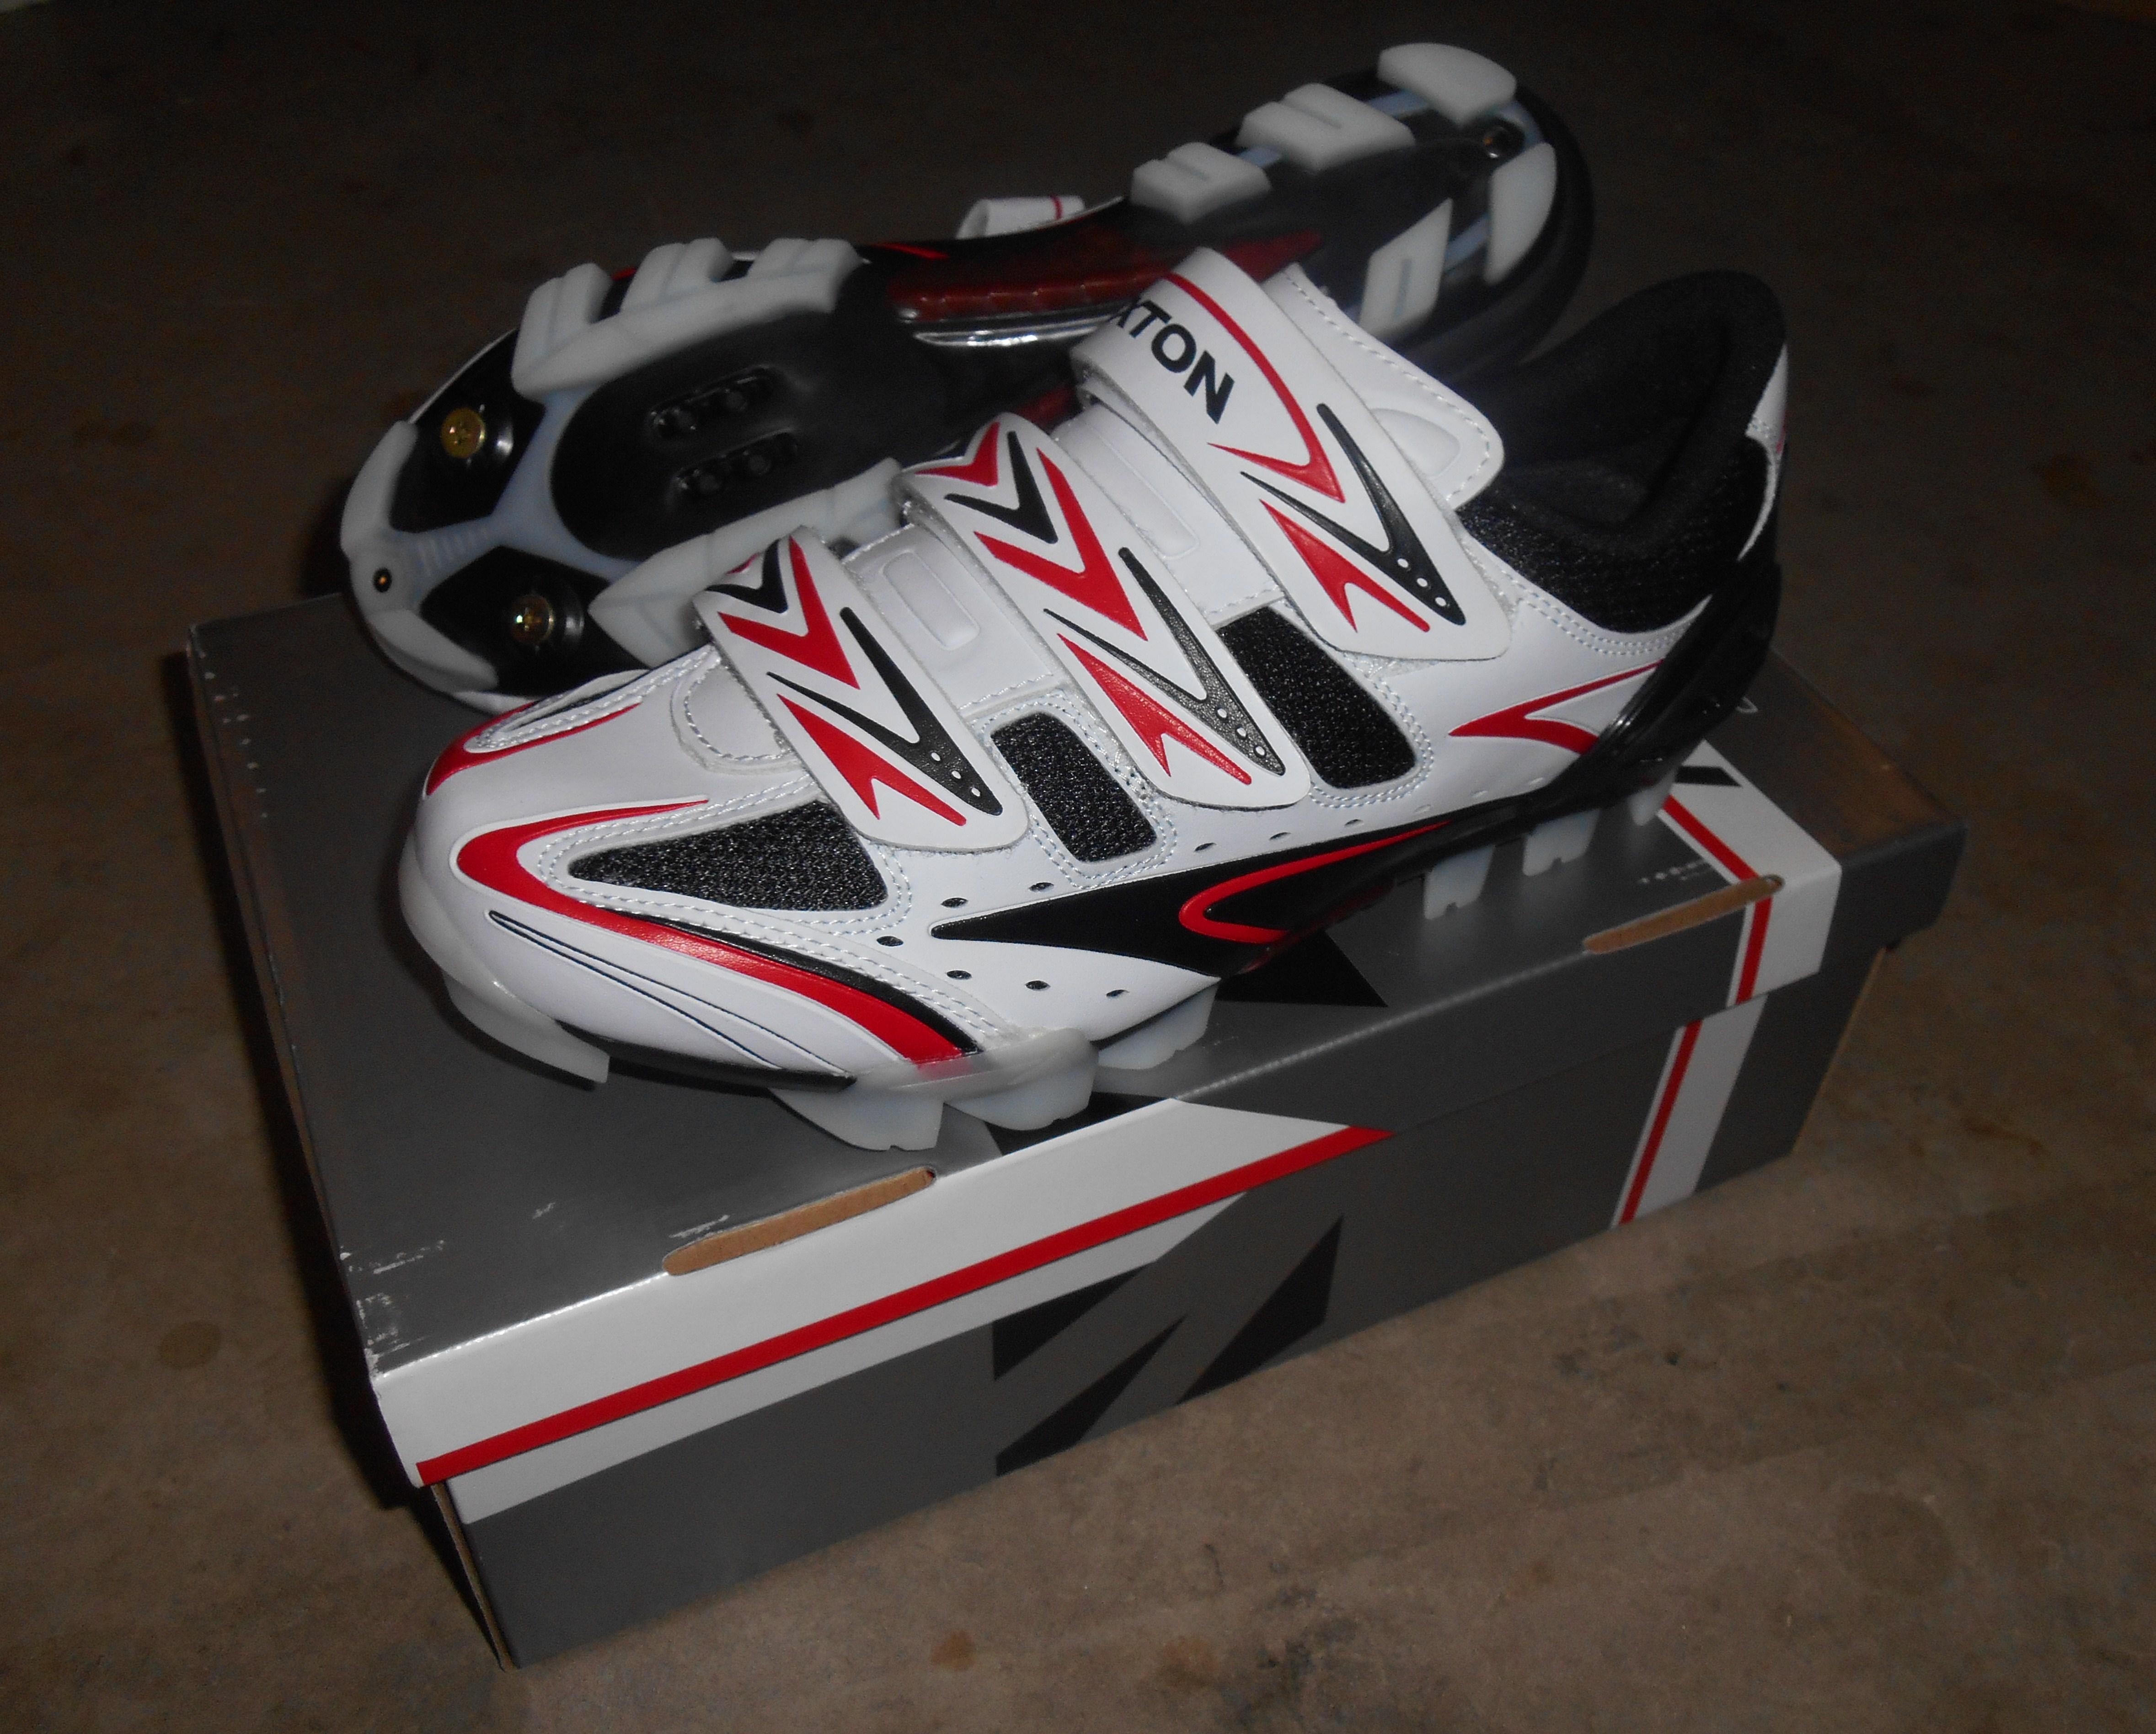 Rexton AB-222 SPD MTB Cycling Shoes size EU 44 / UK 9.5